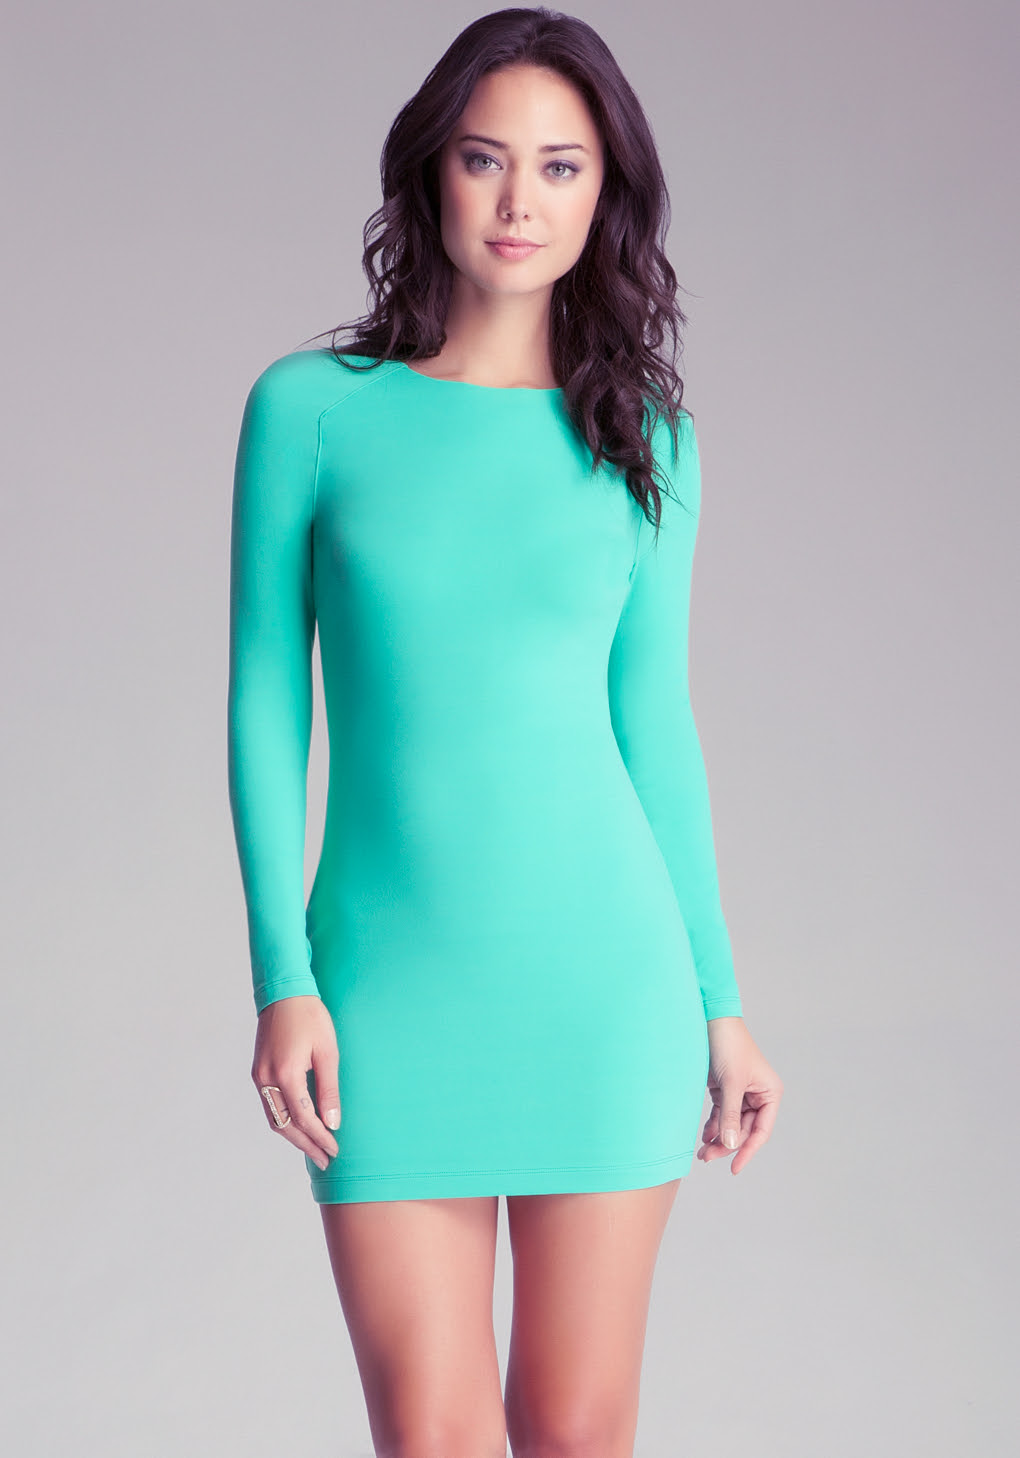 Suppliers dress bodycon green long printed sleeve era david